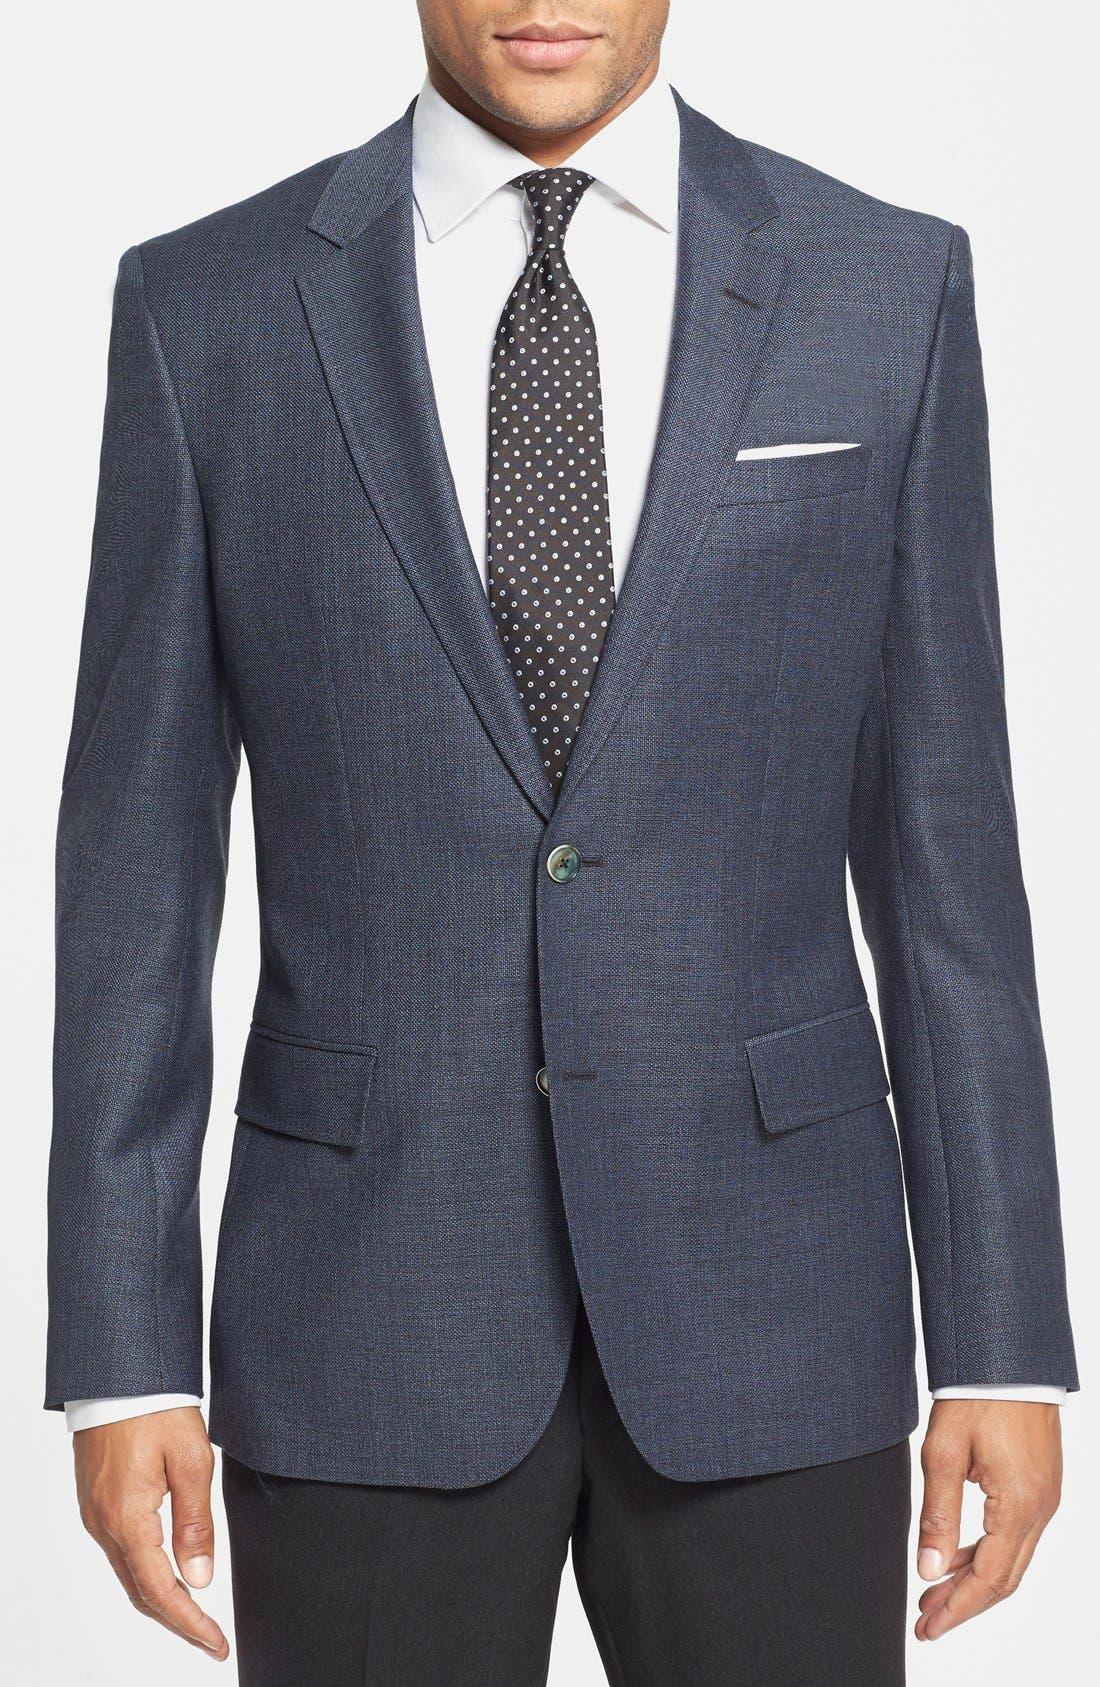 Main Image - BOSS HUGO BOSS 'Hutson' Trim Fit Wool Blazer